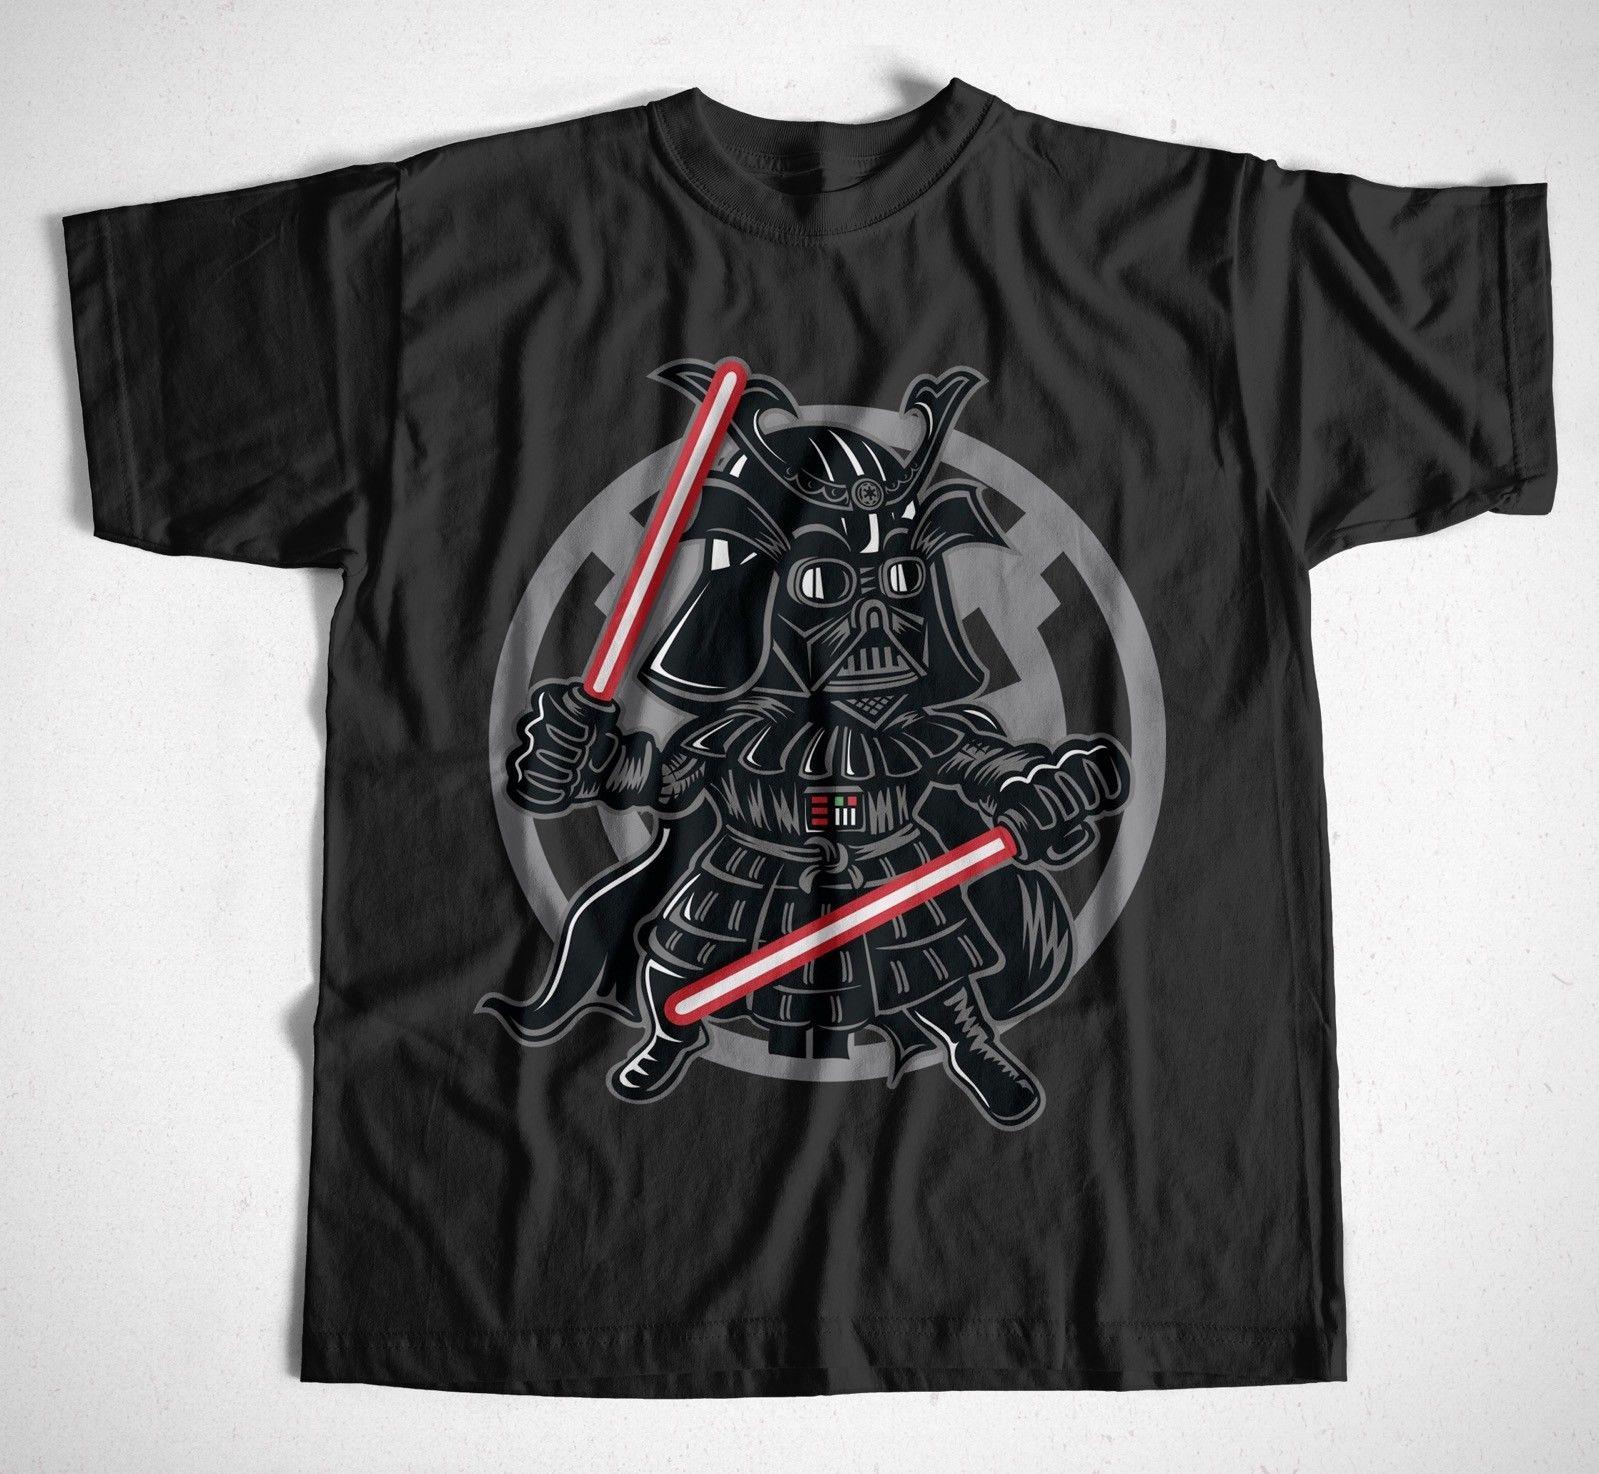 Camiseta Darkside Samurai S-XXXL Darth Vader Star Wars Krieg der Stern Sith Yoda camiseta hombre Camiseta de manga corta